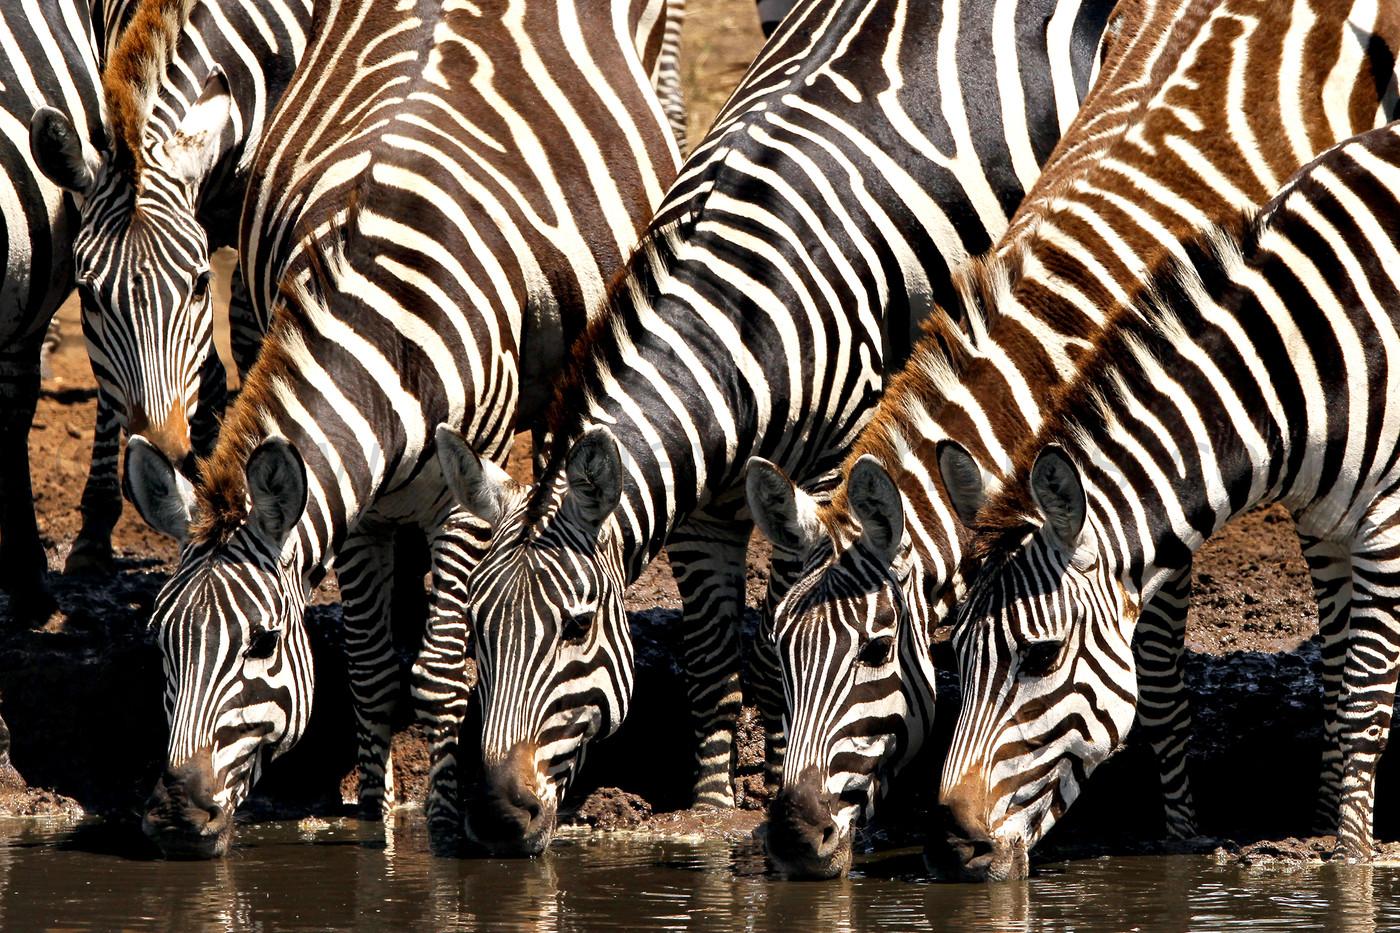 Plains Zebra in the Serengeti NP, Tanzania